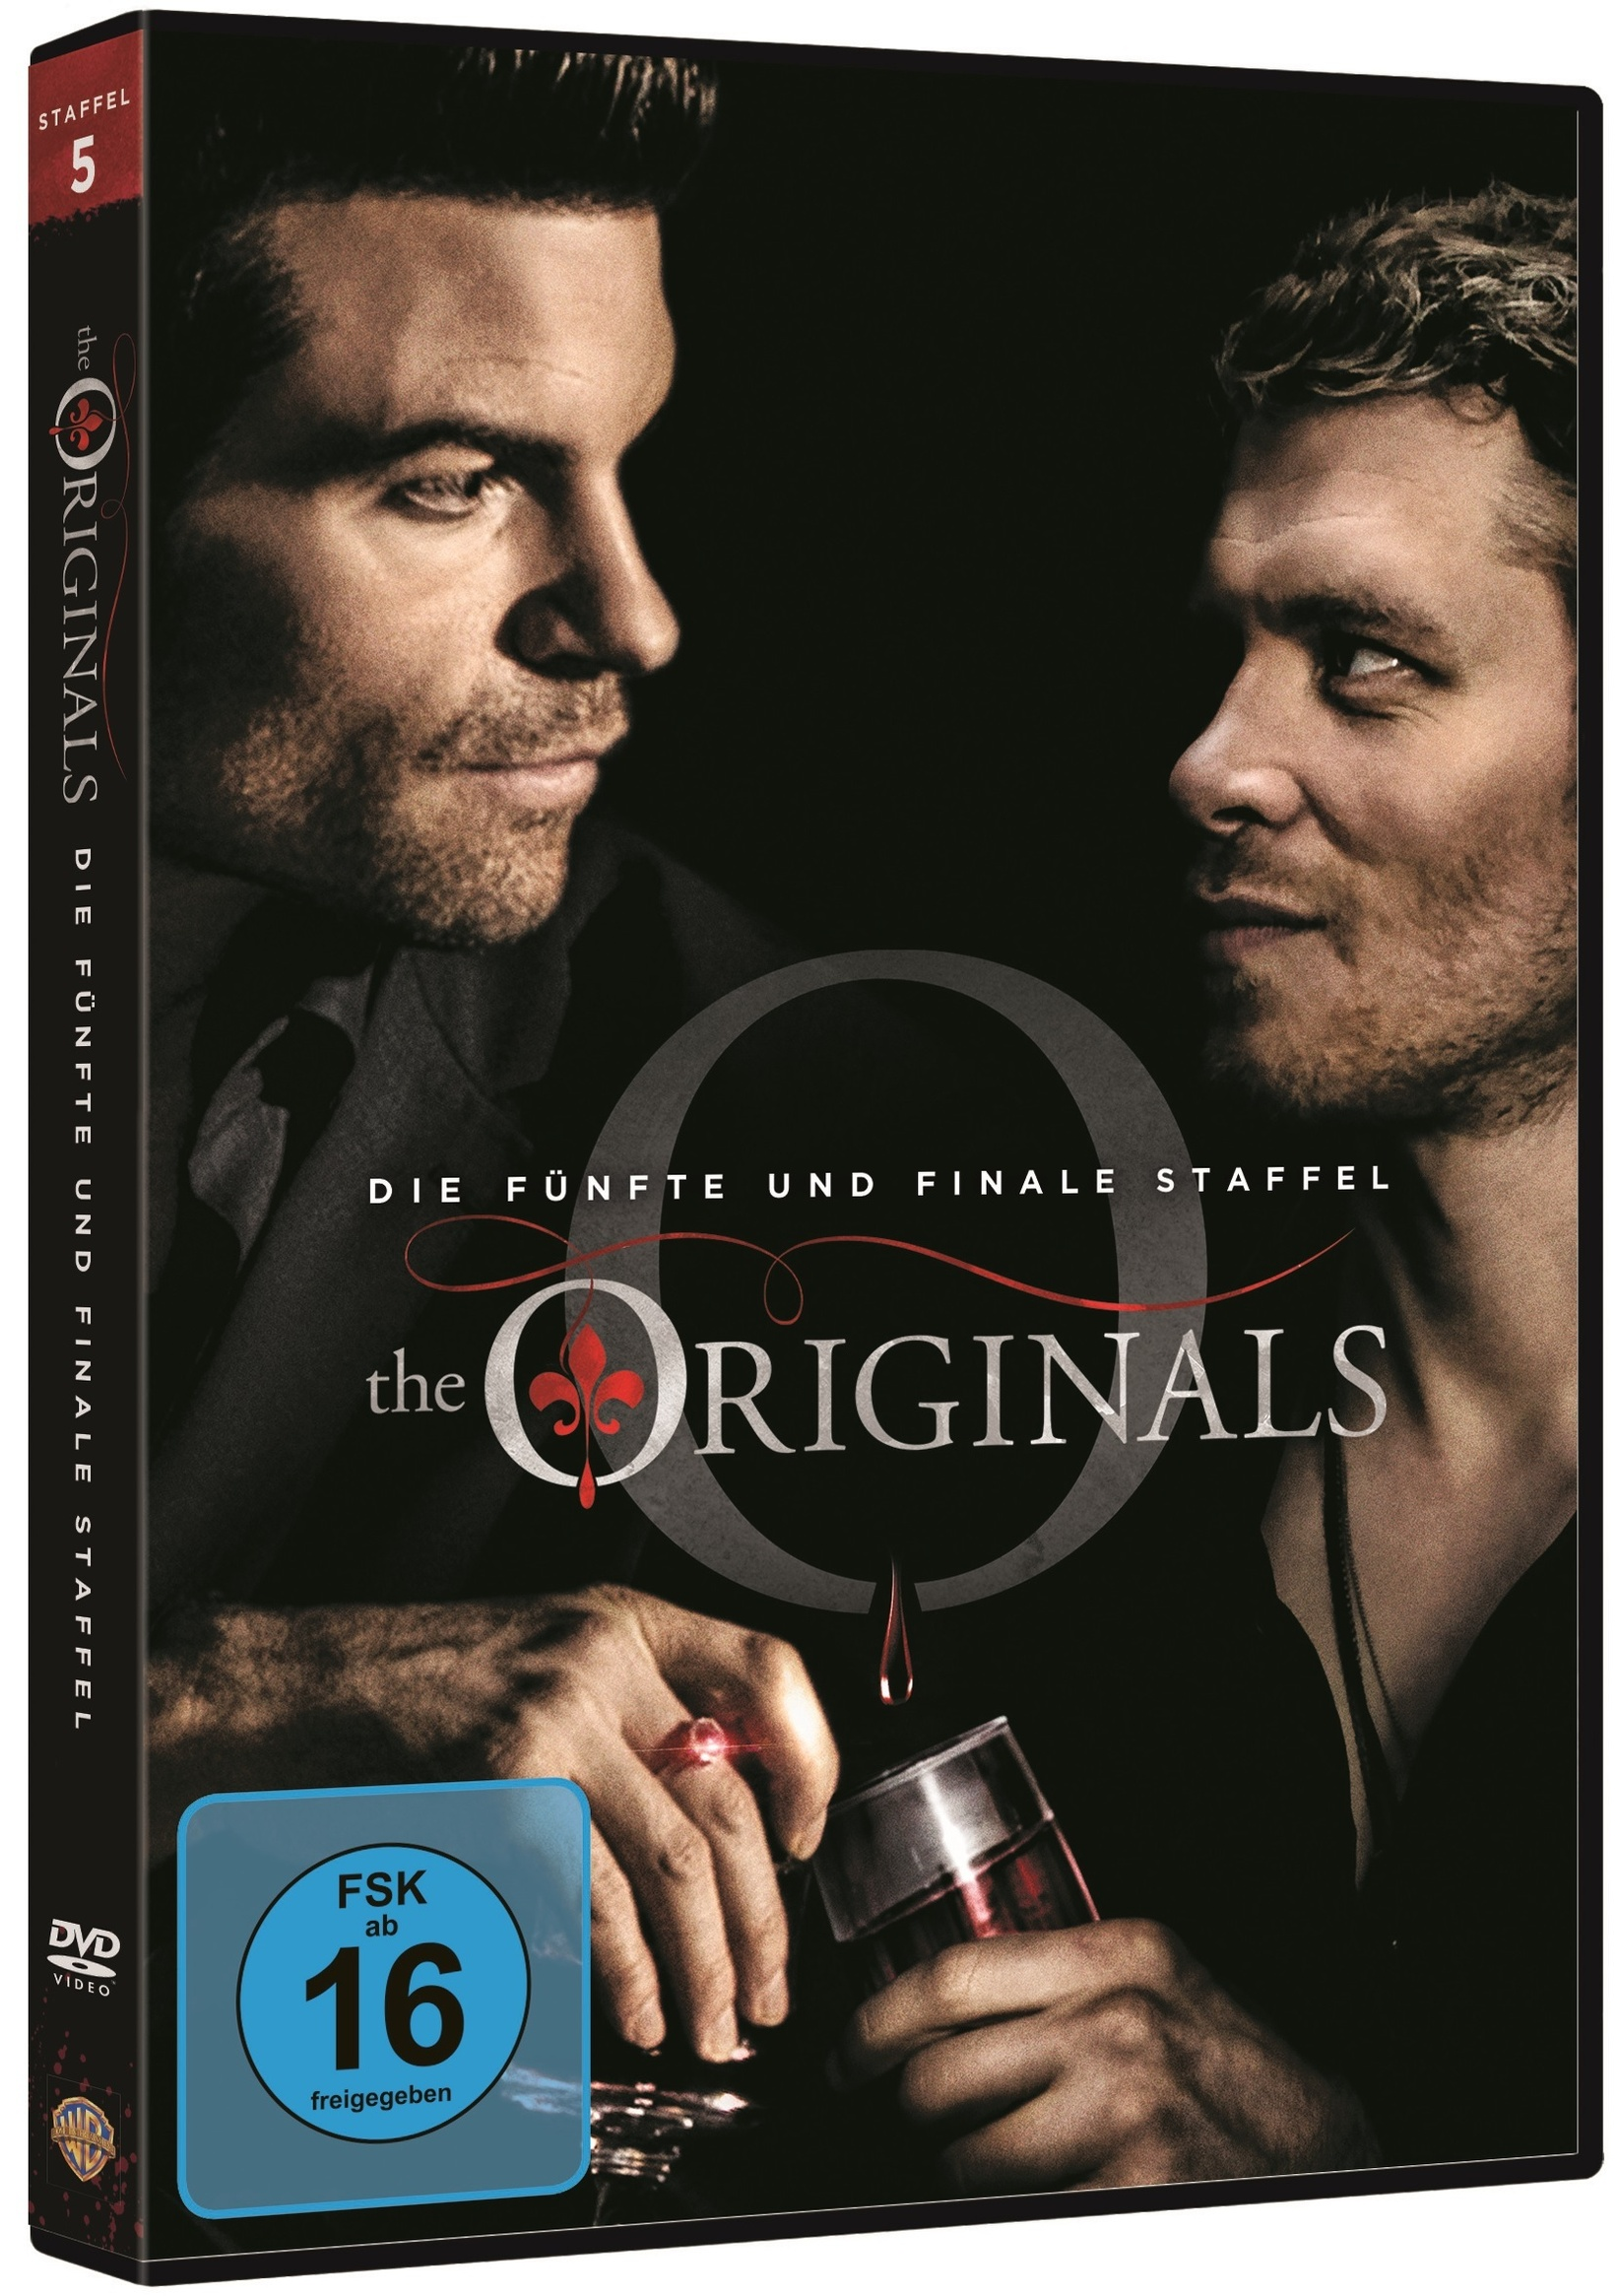 The Originals Staffel 5 Episodenguide